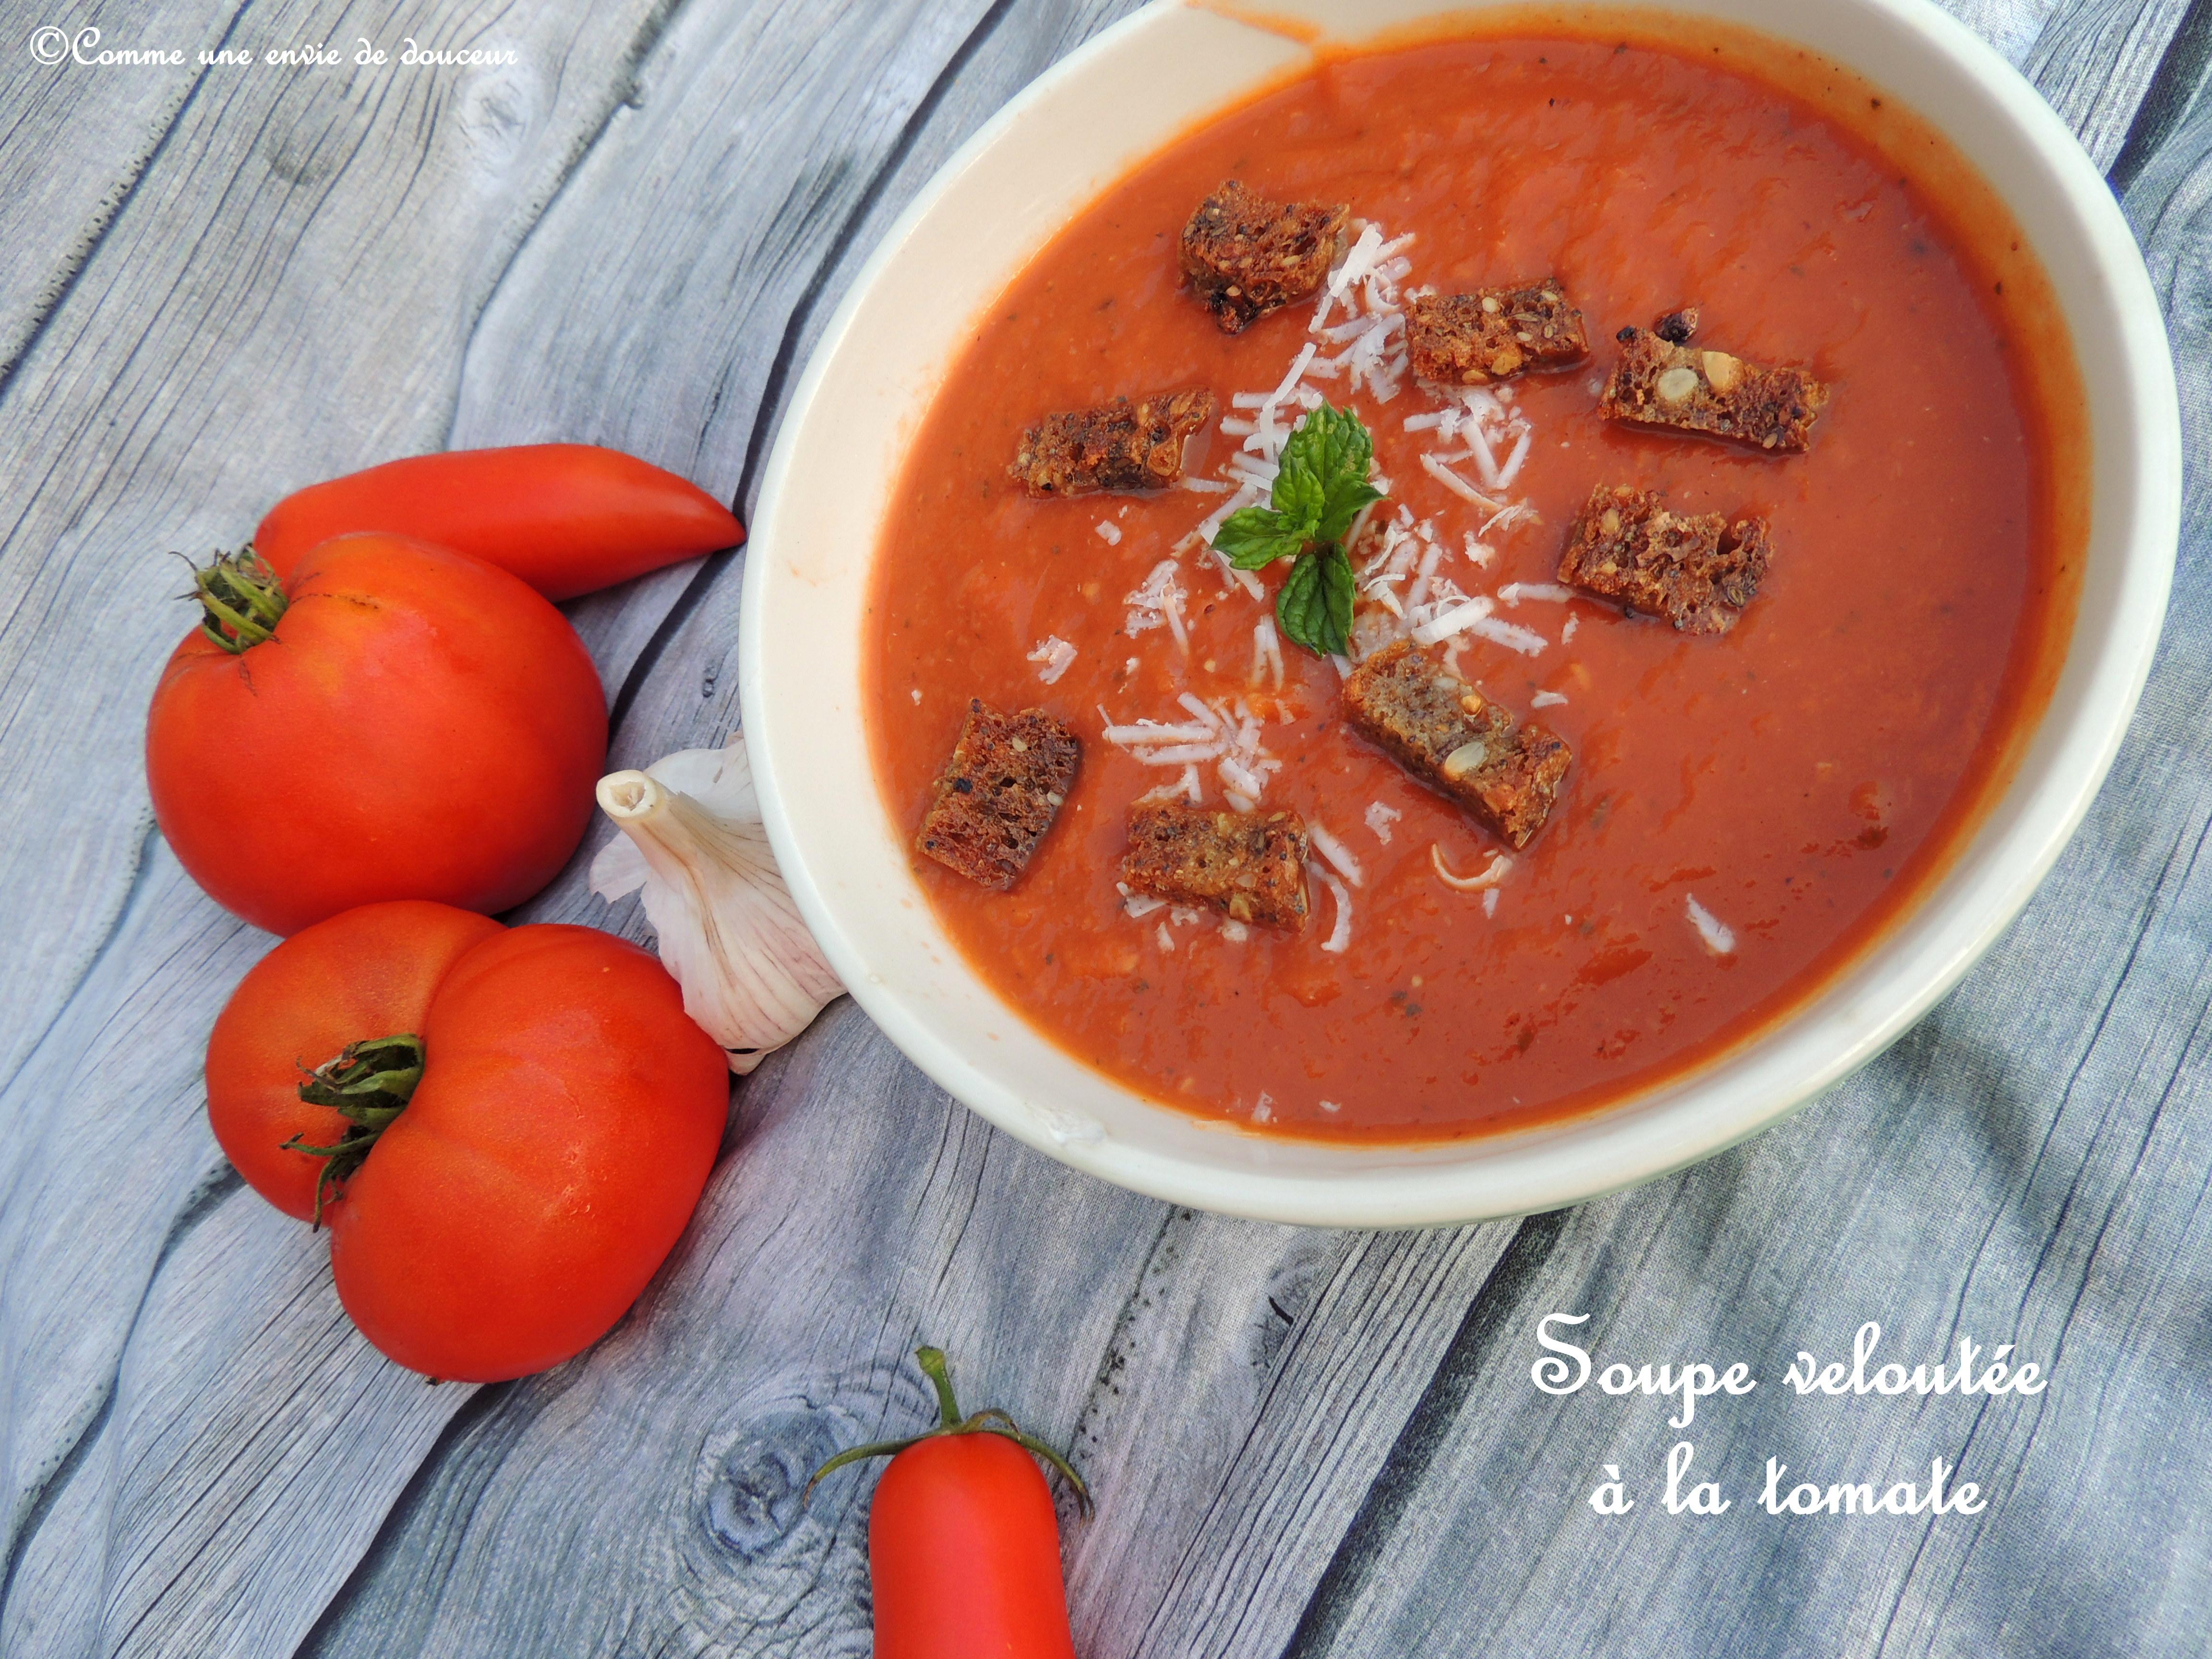 Soupe à la tomate – Tomato soup